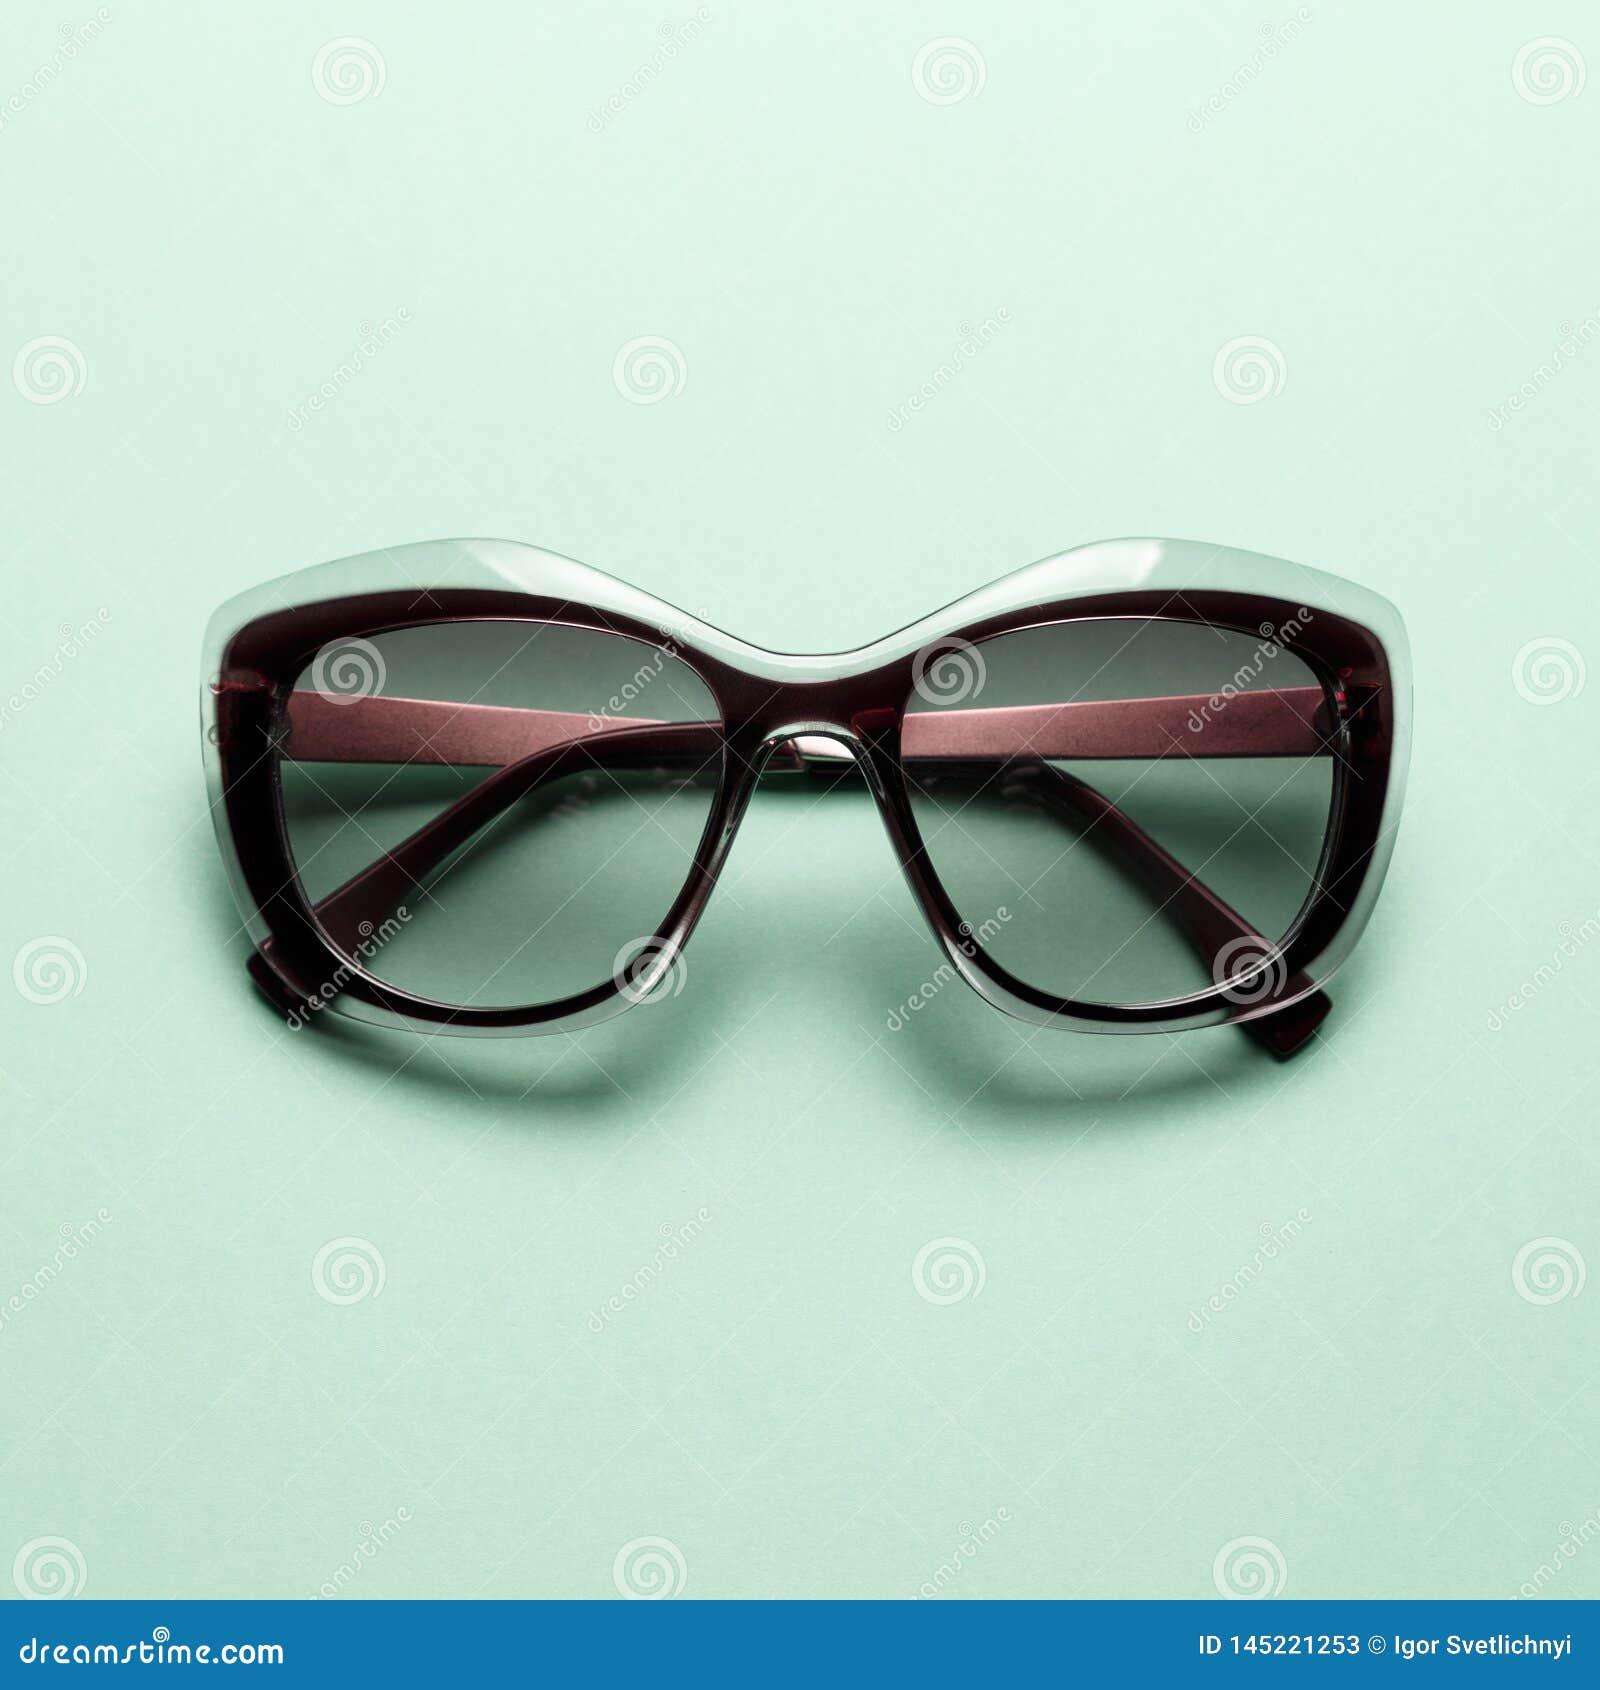 Fashion sunglasses on Mint background